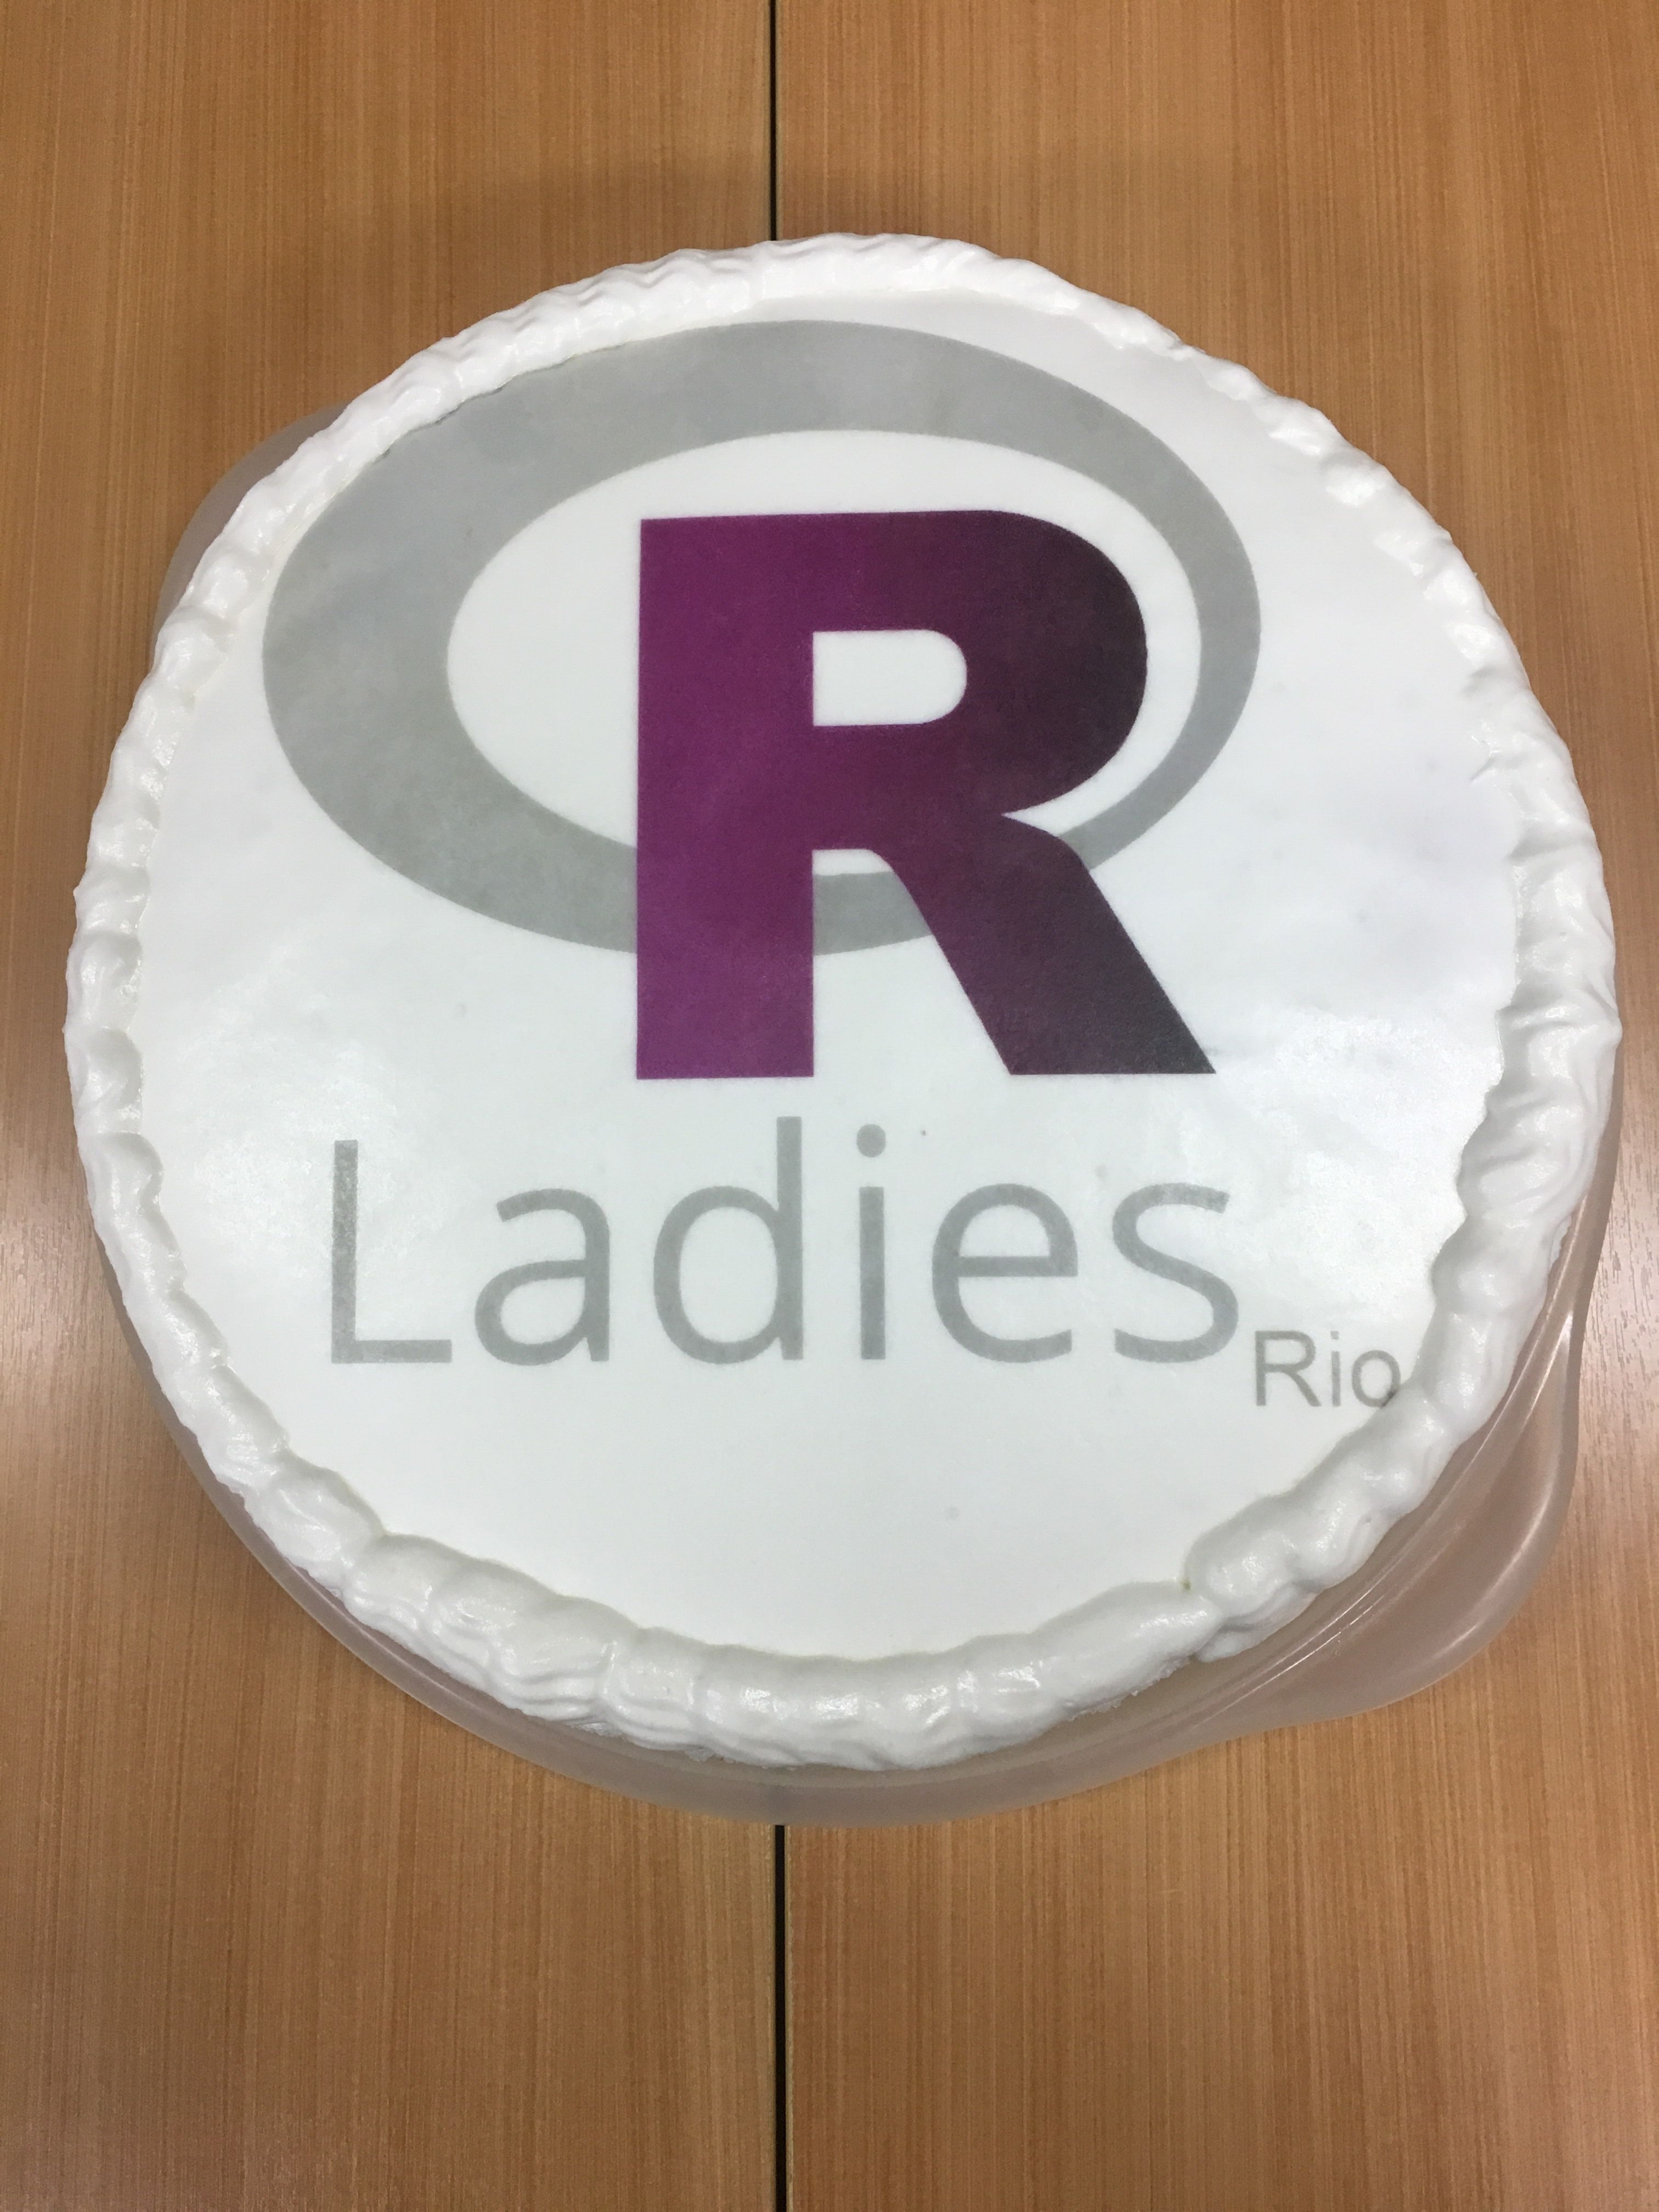 R-Ladies Rio de Janeiro